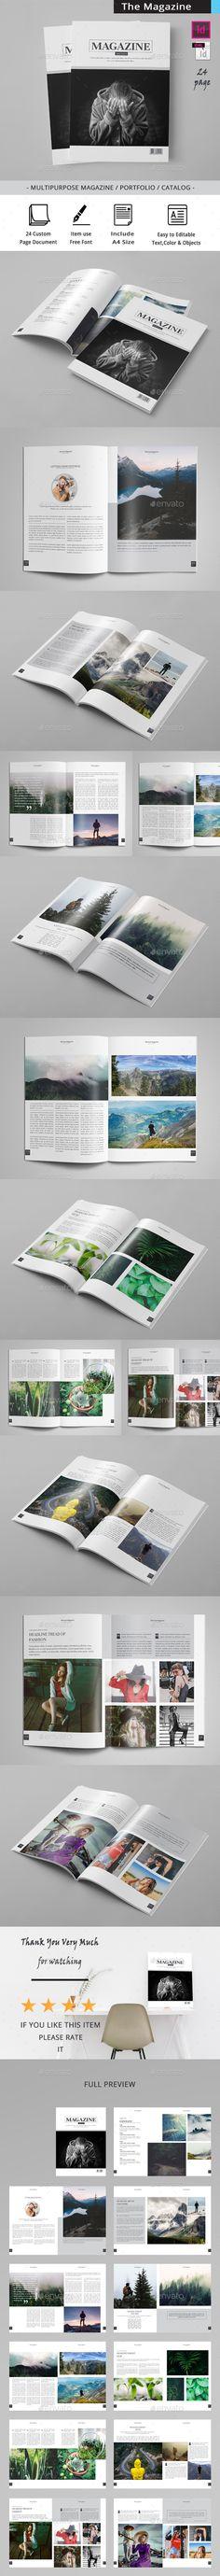 Minimal Magazine Template - #Magazines Print #Templates Download here: https://graphicriver.net/item/minimal-magazine-template/19725662?ref=alena994